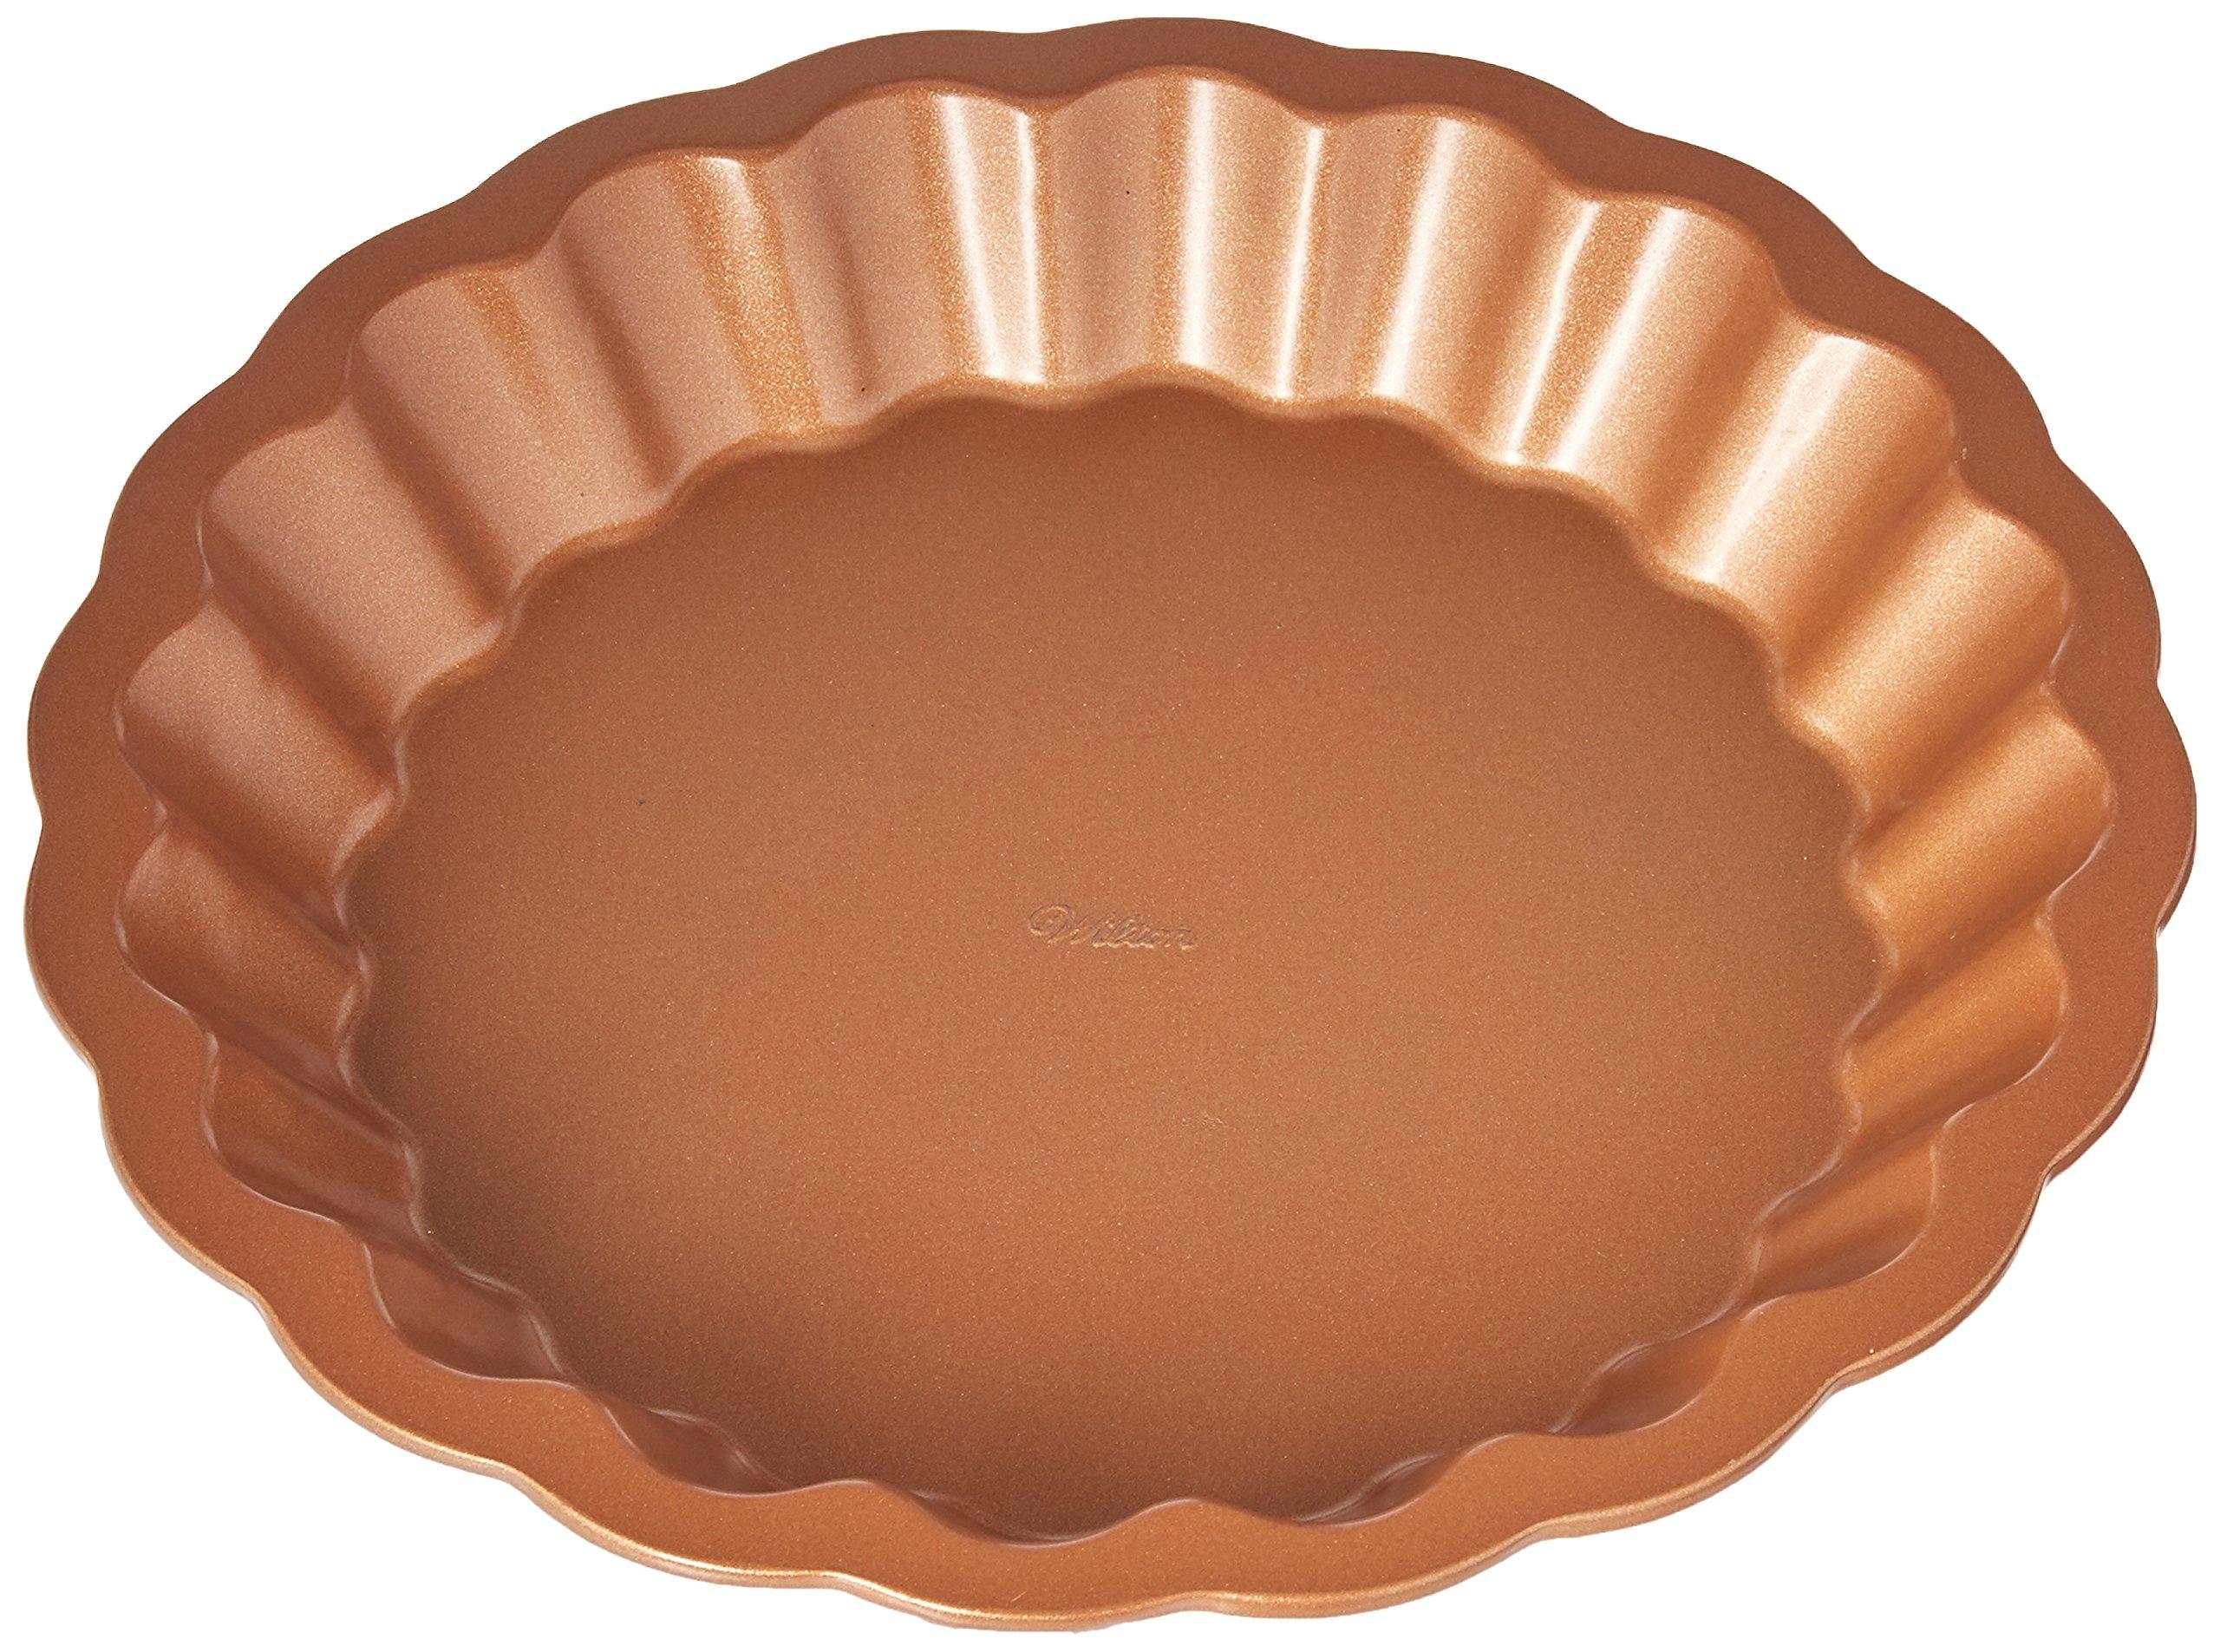 Wilton Decorative Crust Pie Pan